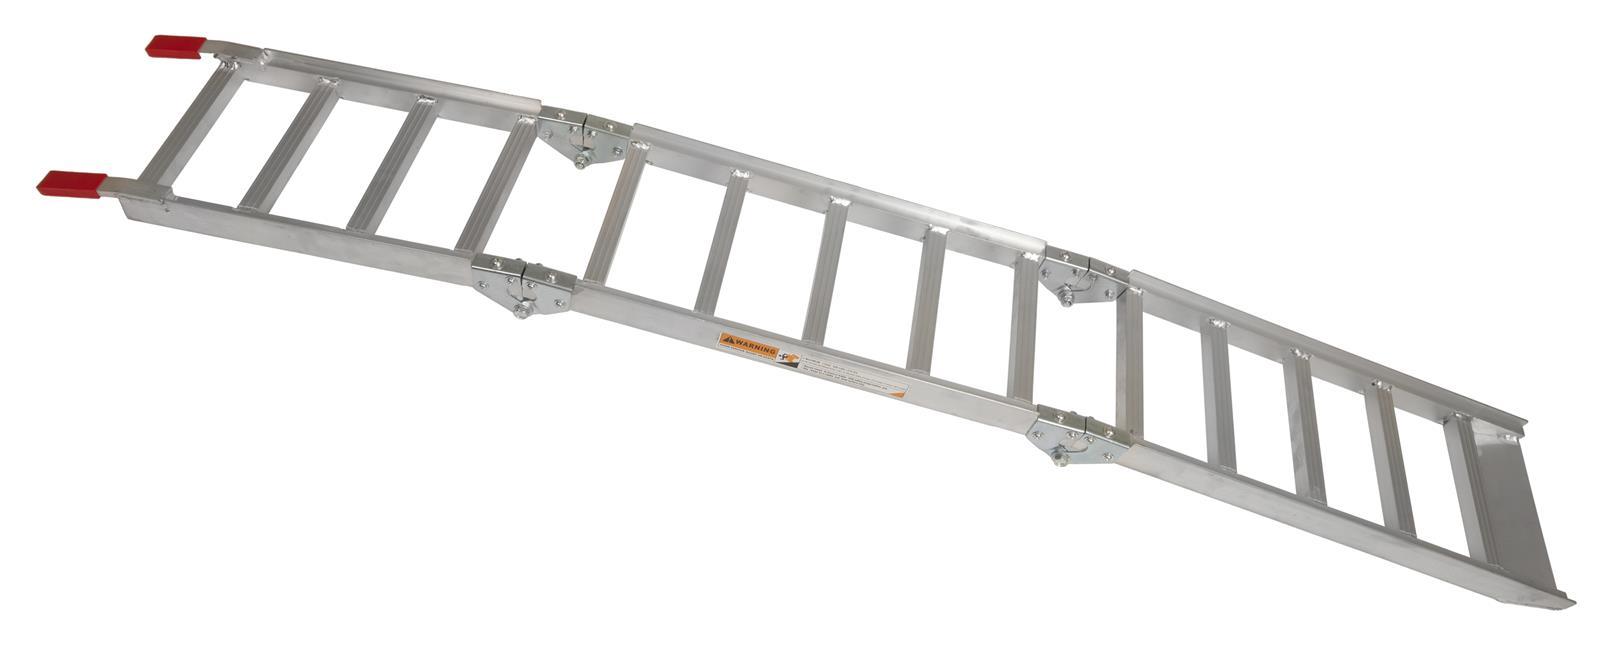 ramp loading ramp 600 lb  capacity 78 500 u0026quot  length 11 750 u0026quot  width alum  natural ea